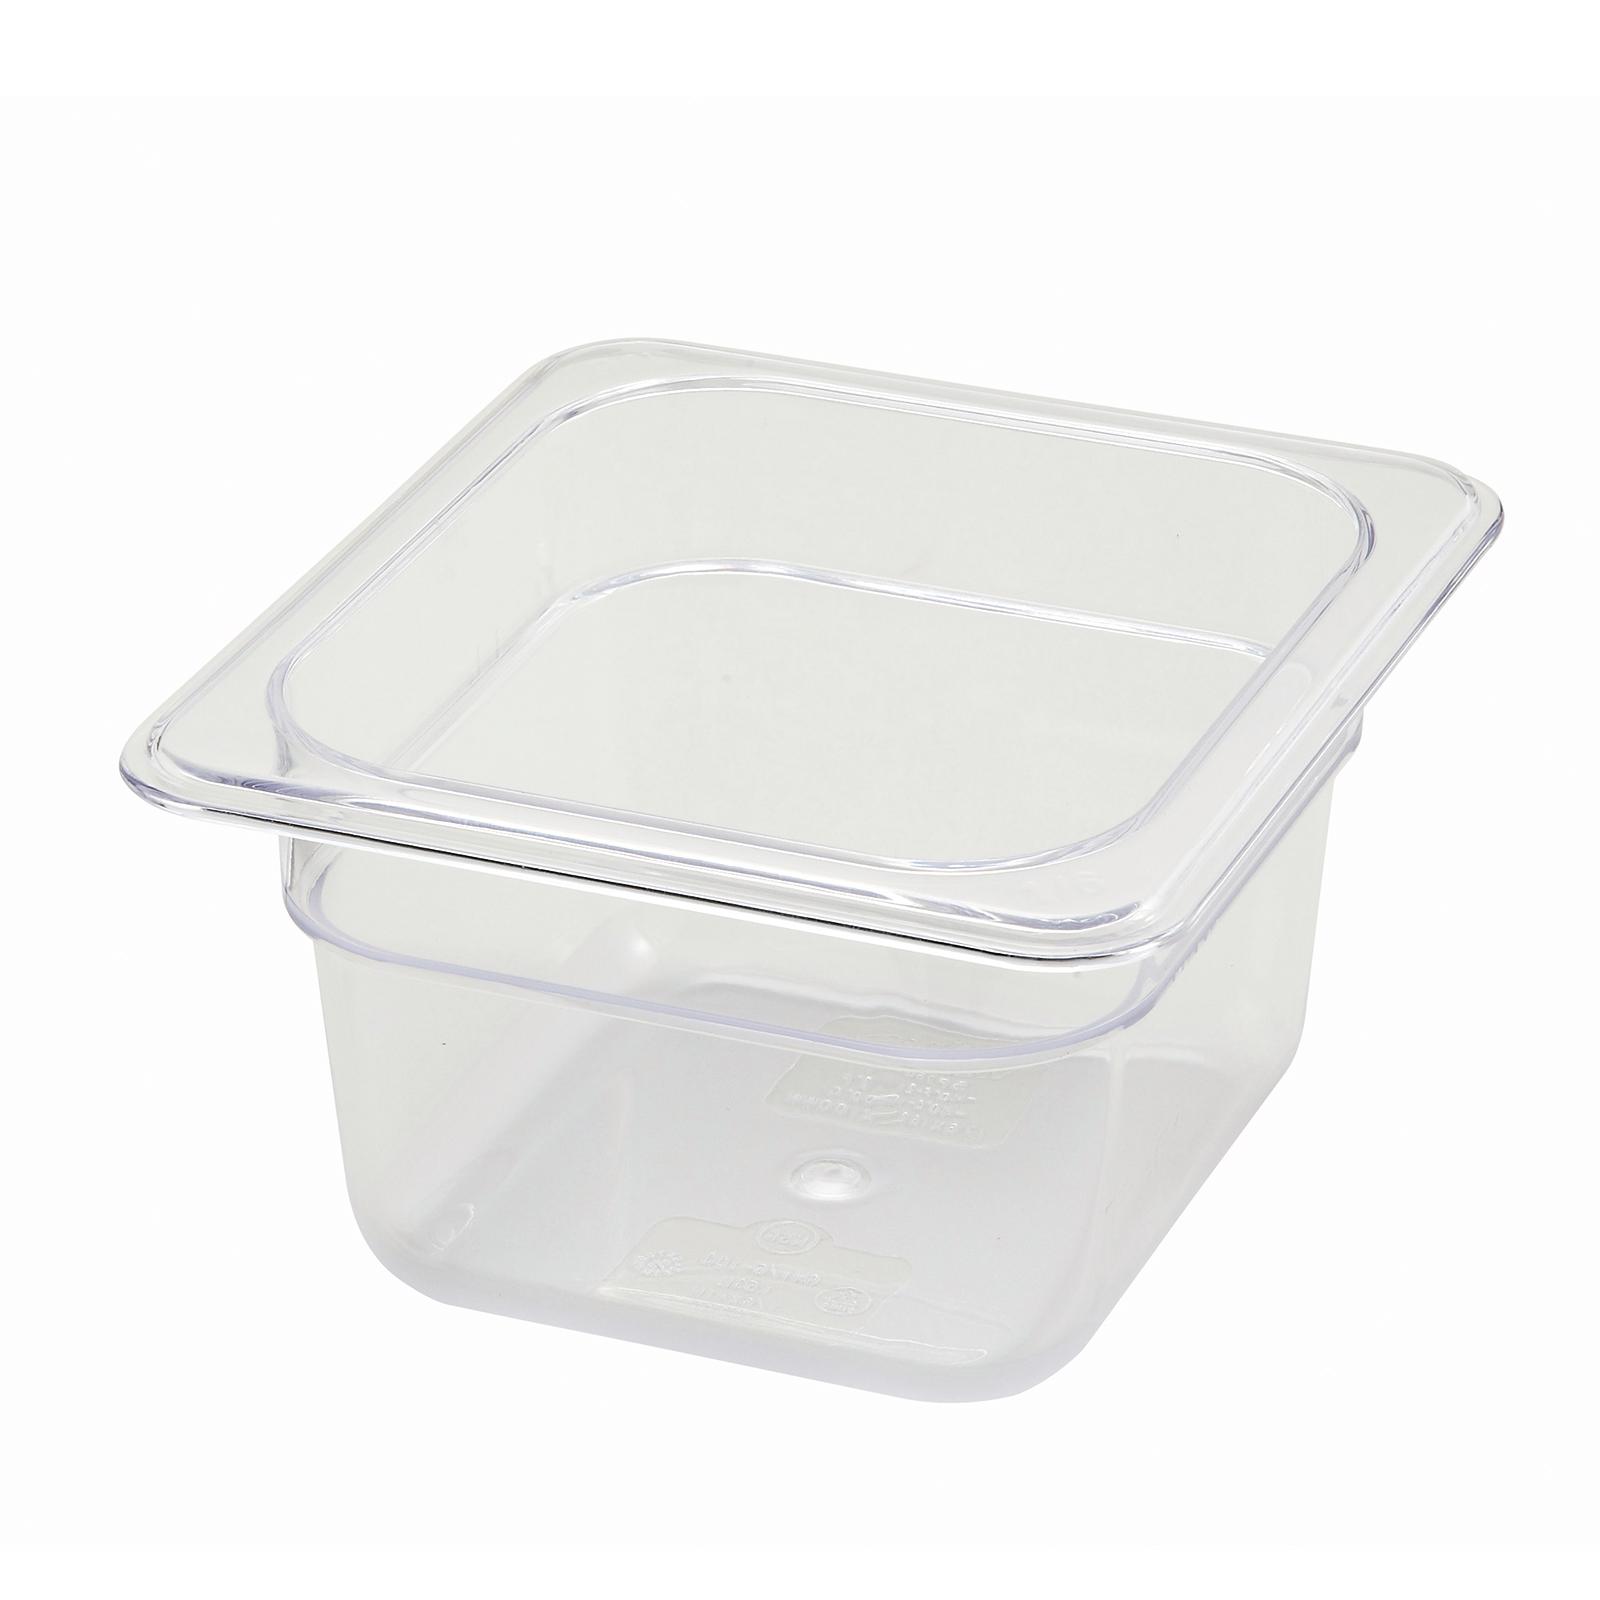 Winco SP7604 food pan, plastic